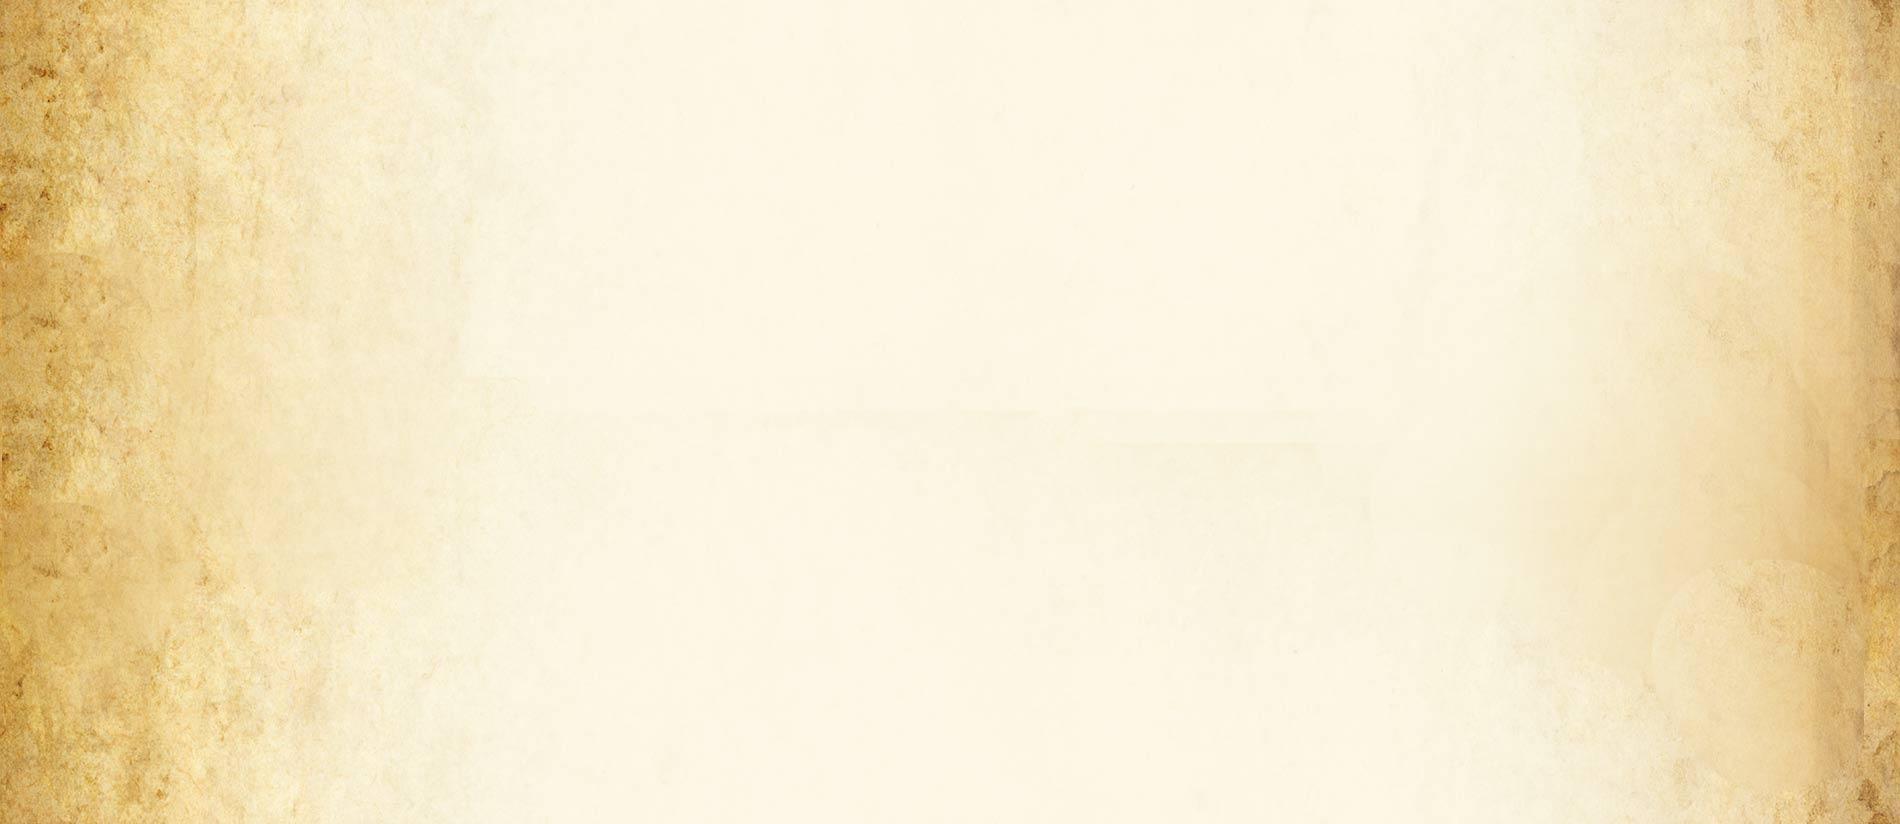 parchment-background.jpg